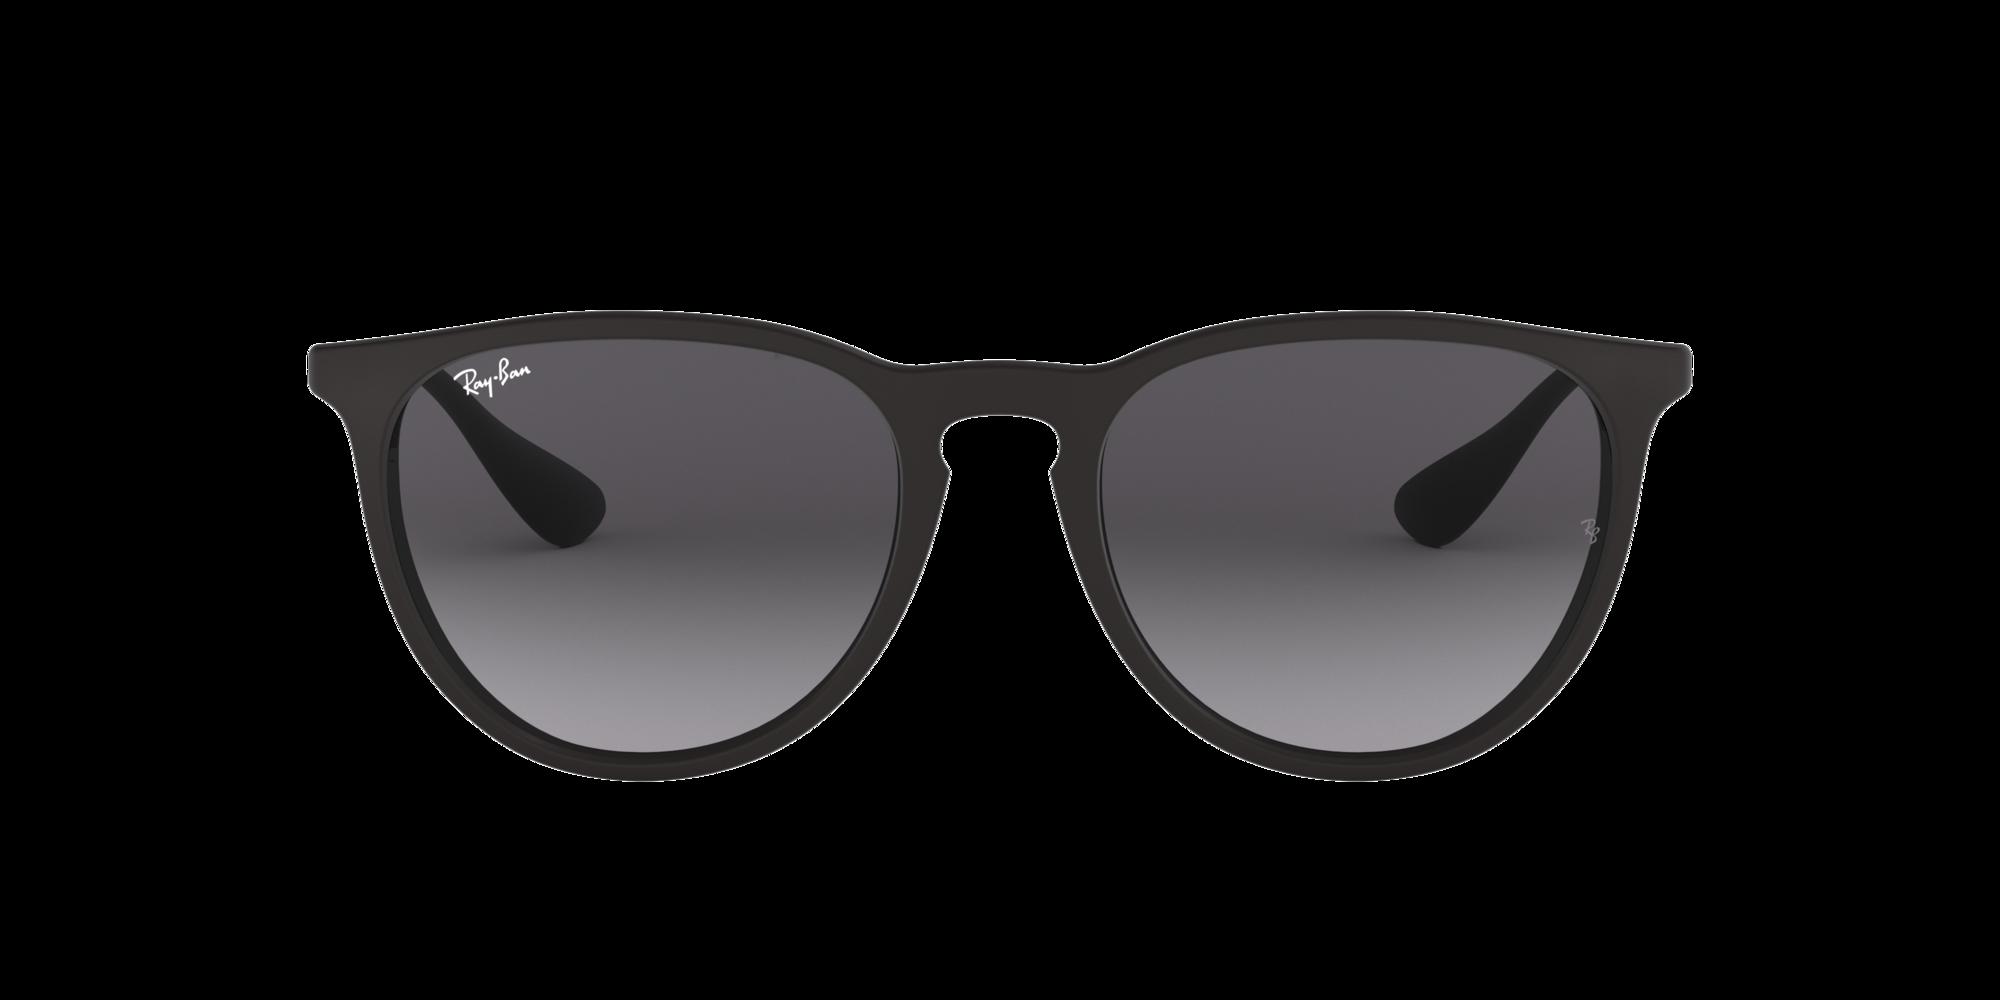 Image for RB4171 54 ERIKA from LensCrafters   Glasses, Prescription Glasses Online, Eyewear